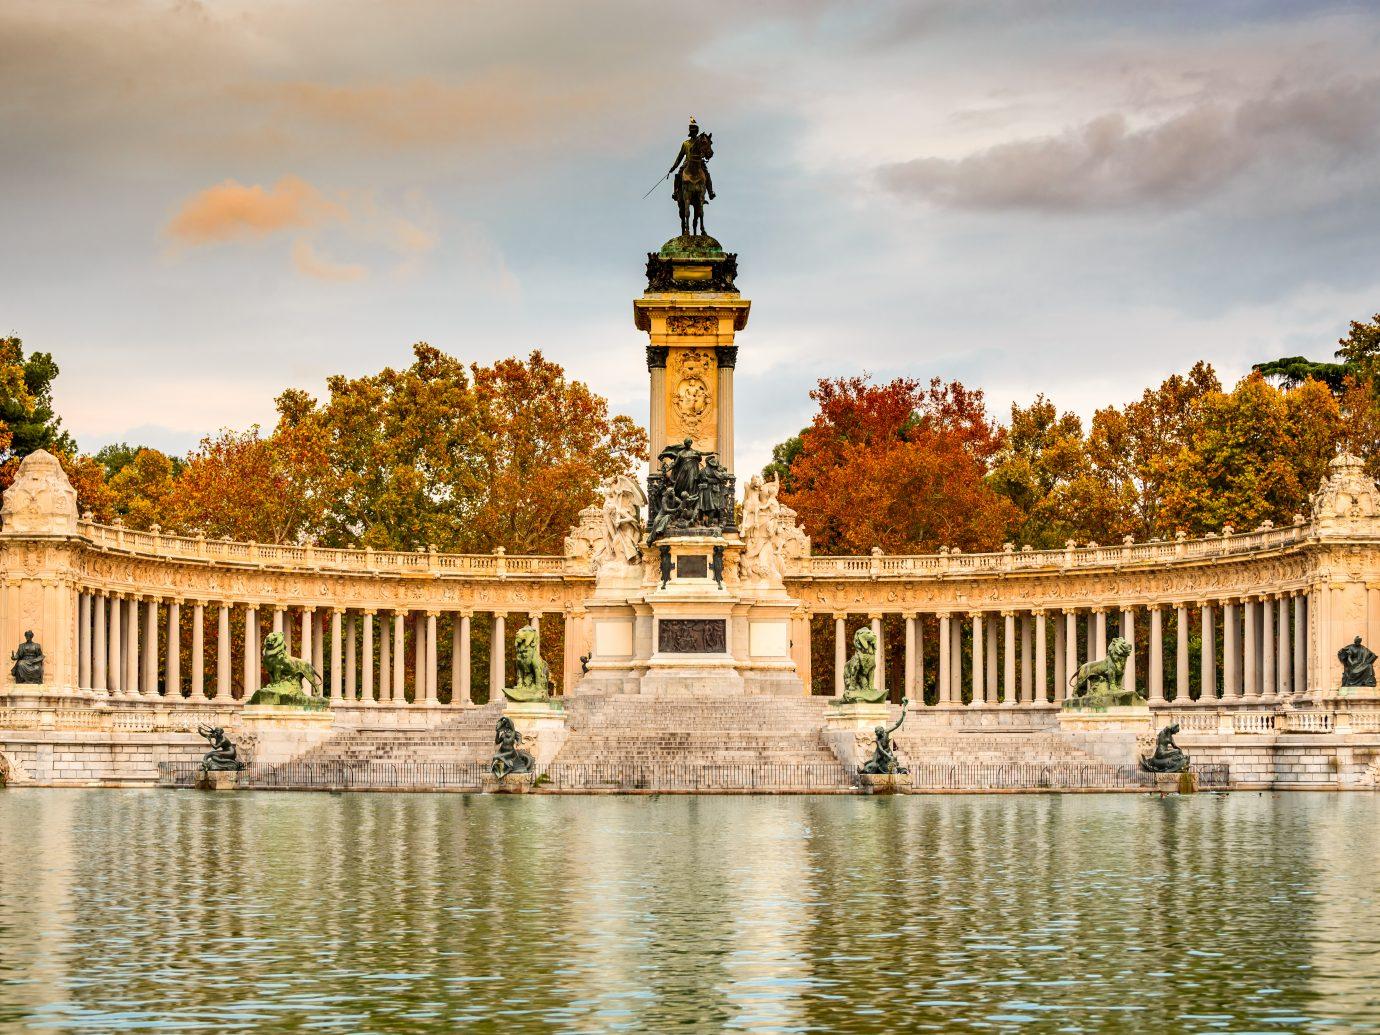 Madrid, Spain. Buen Retiro park, outdoor natural landmark of Spanish capital city.